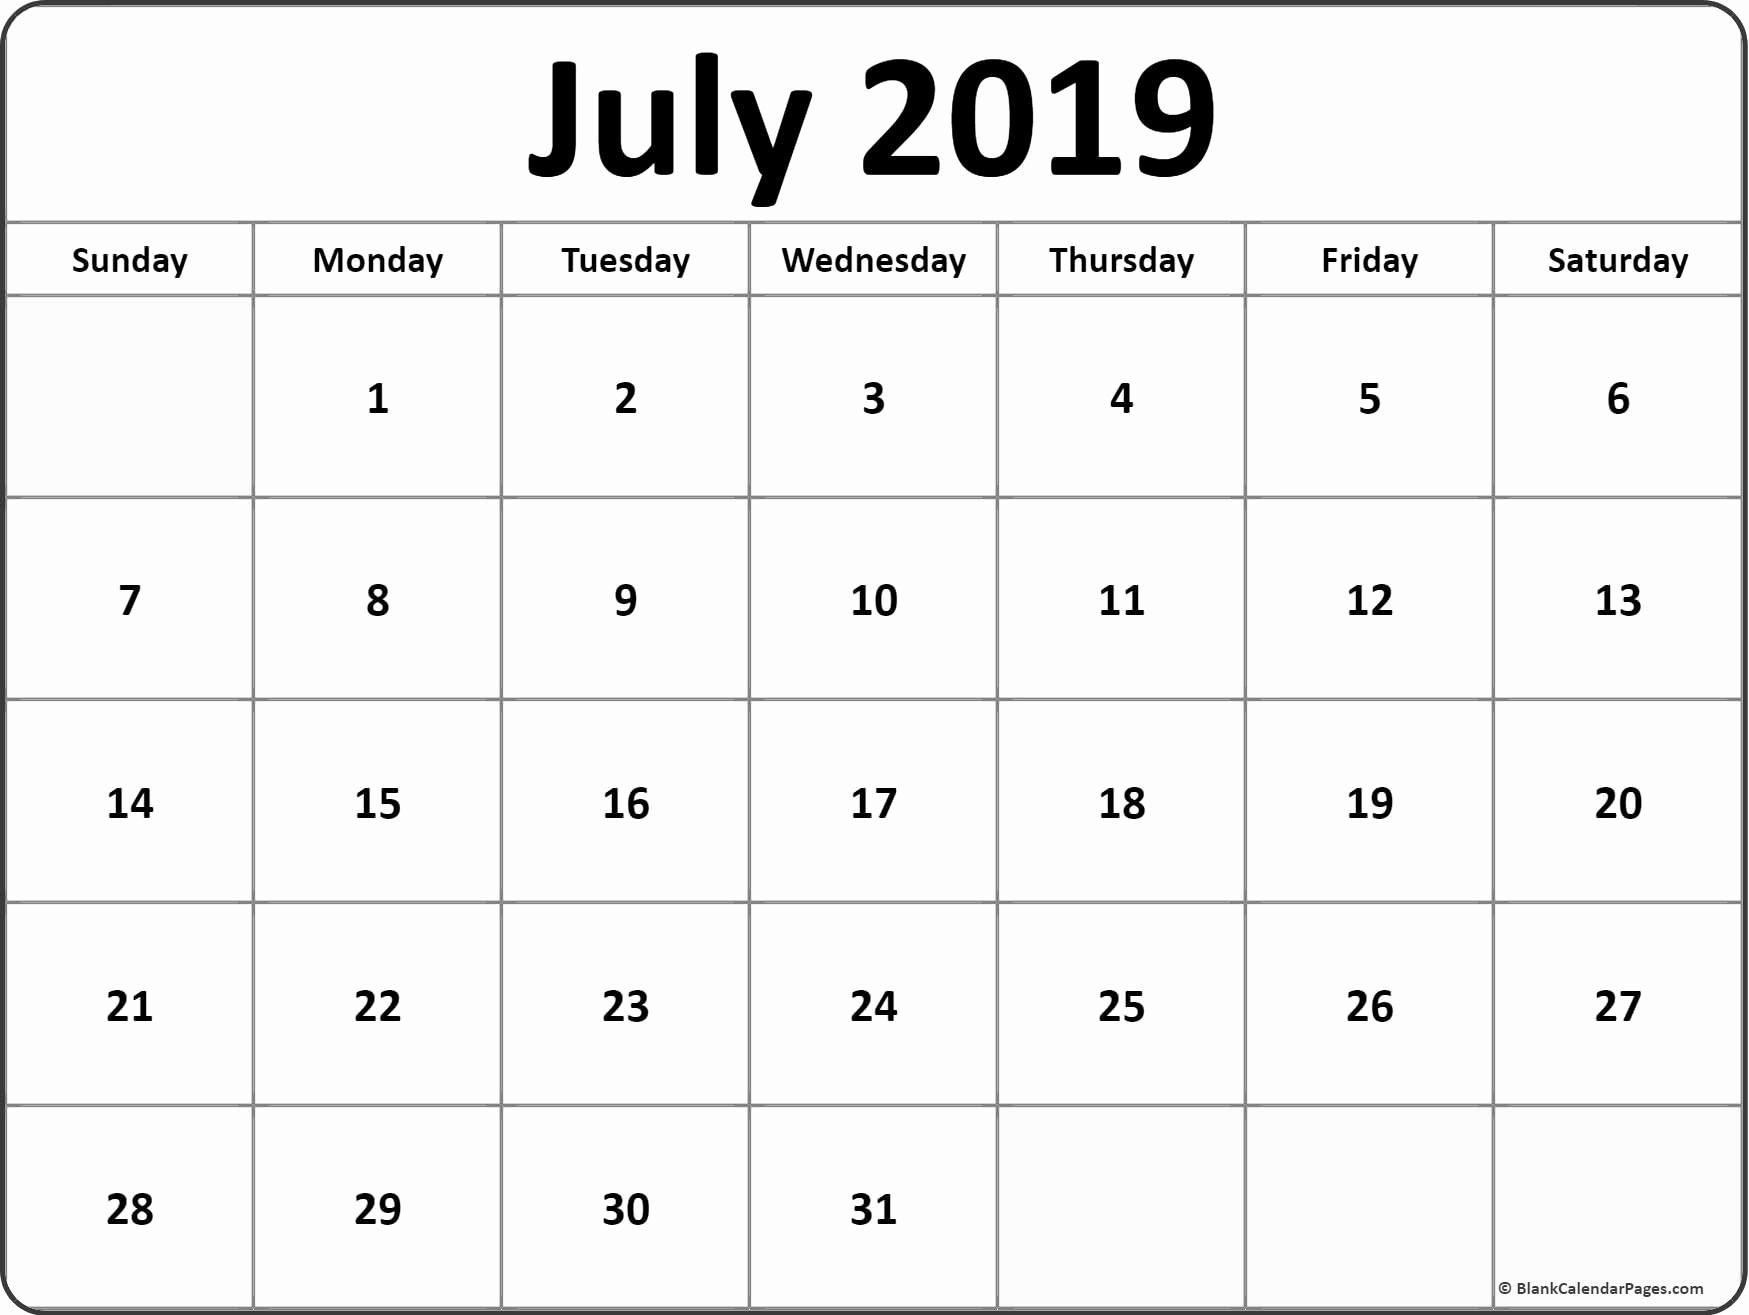 July 2019 Calendar Pdf July July2019 July2019calendar 2019calendar Printable Calendar July Weekly Calendar Template Monthly Calendar Printable